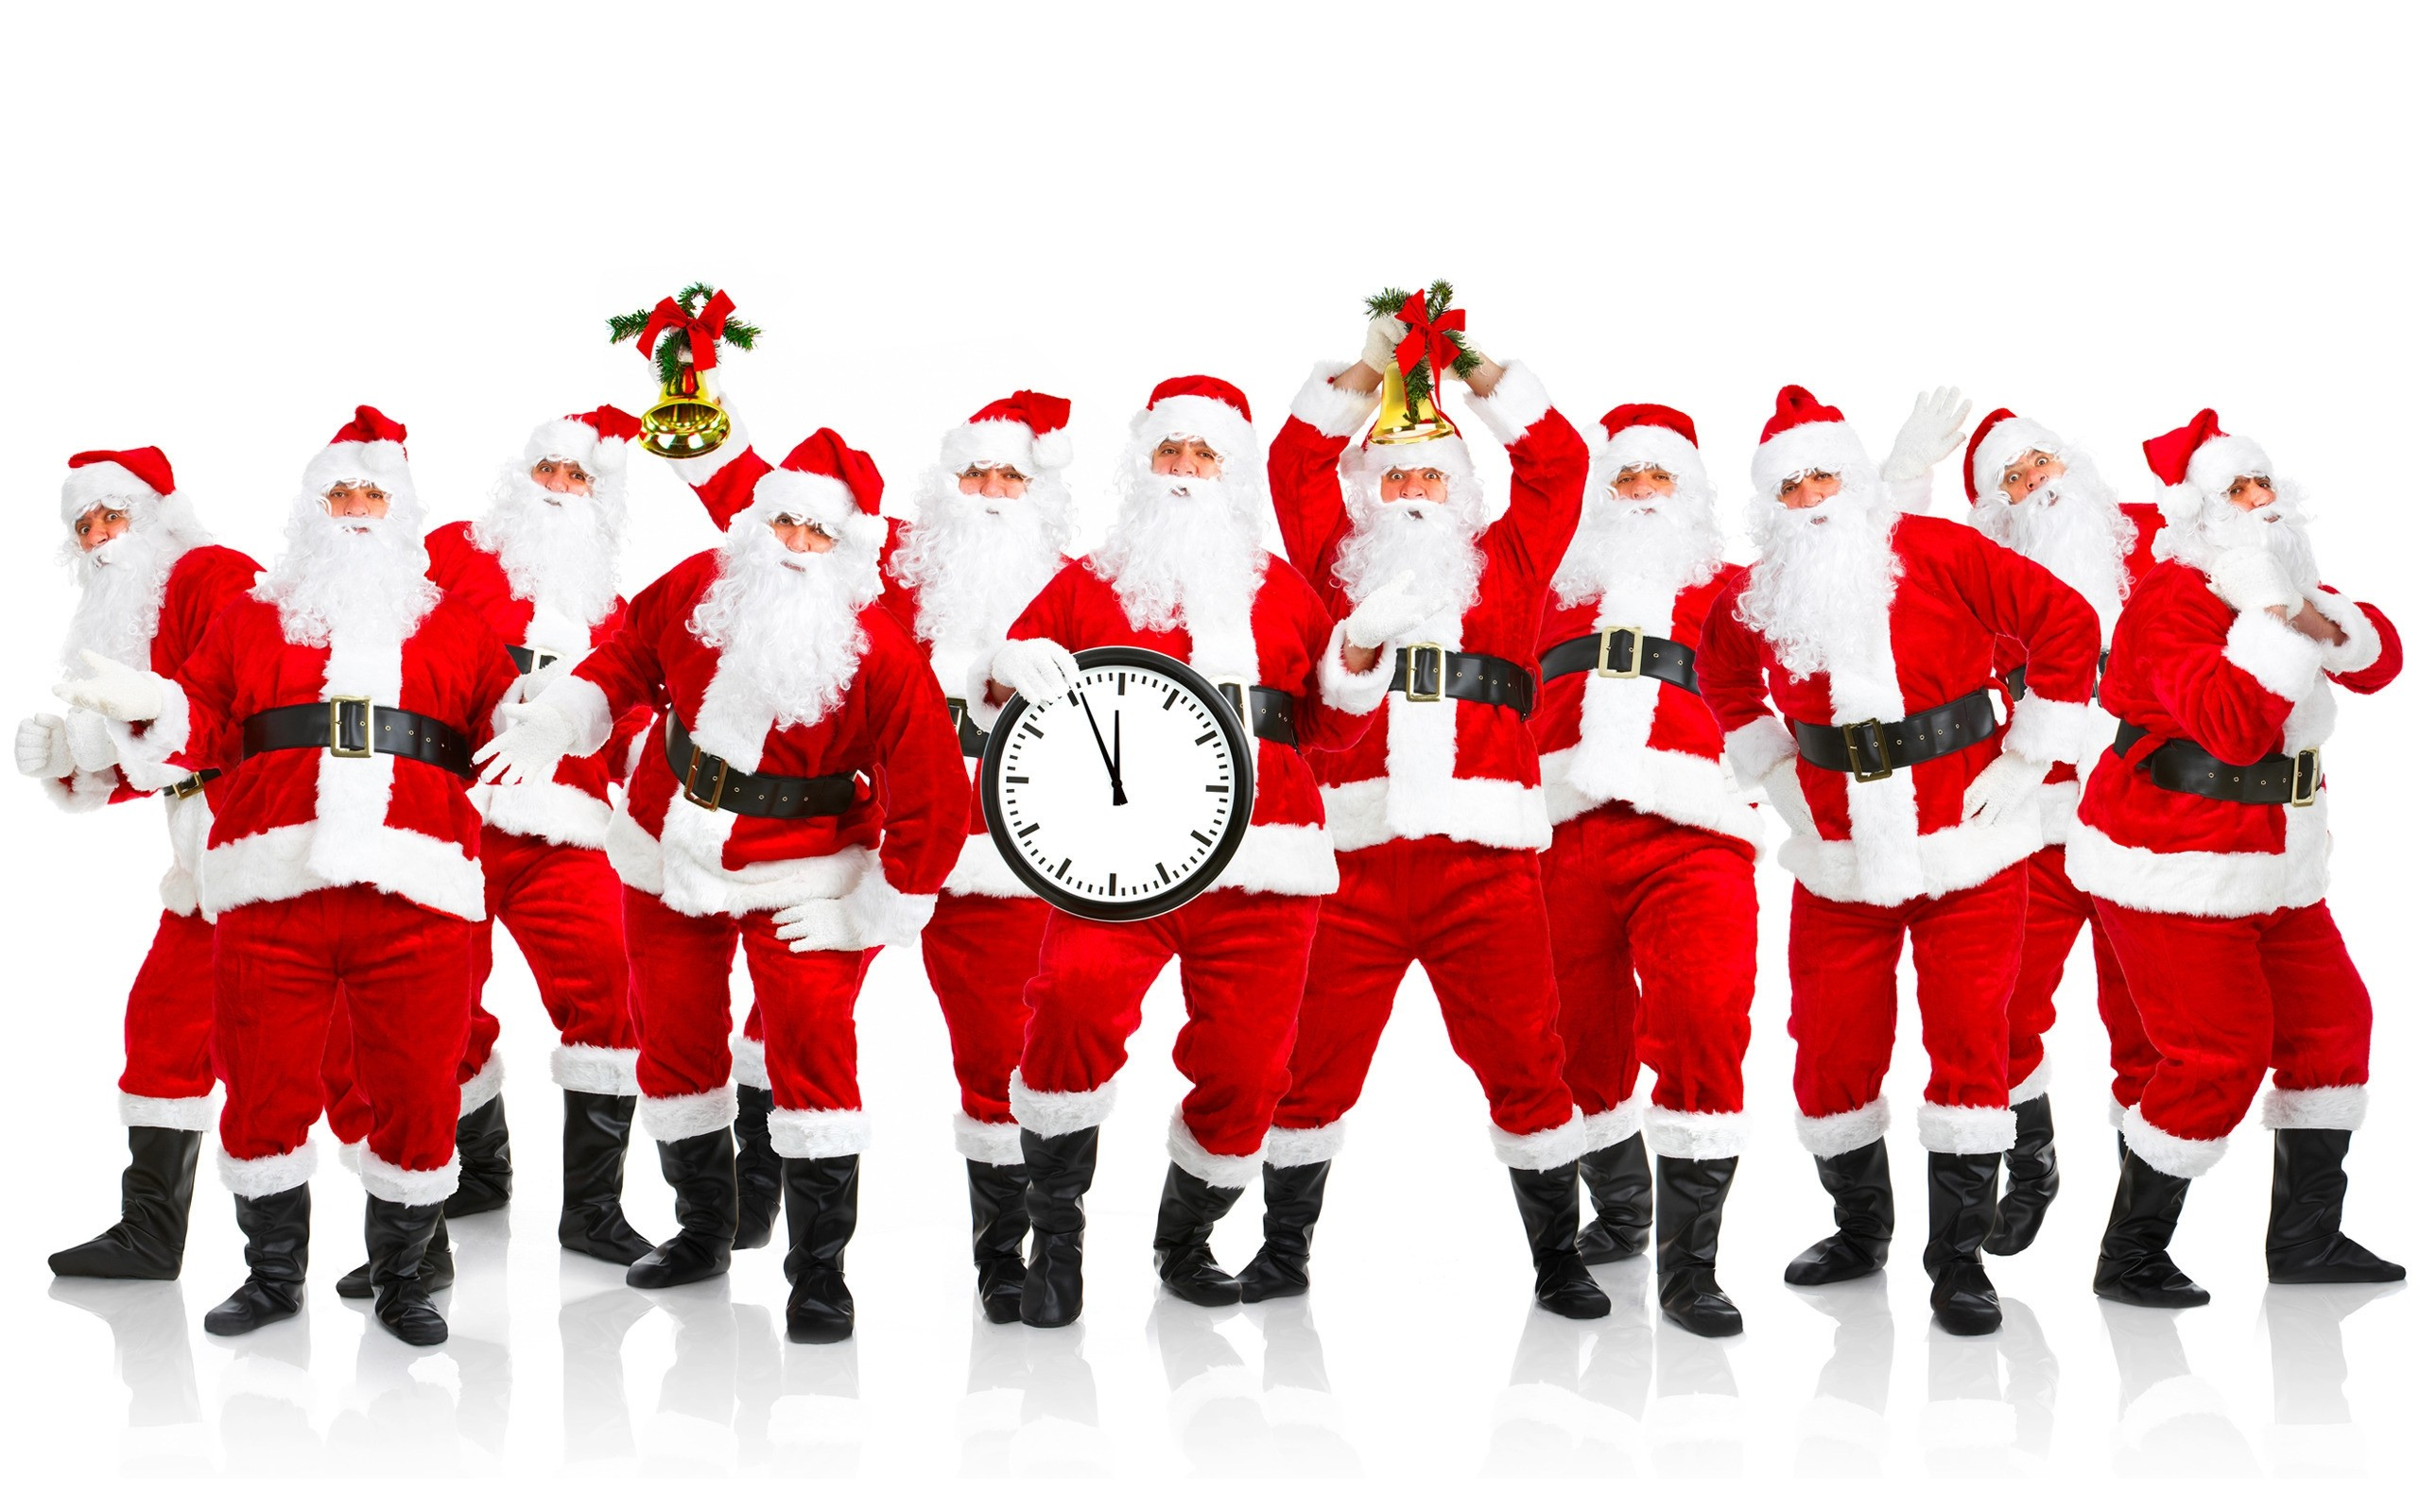 Muchos Santas Claus - 2560x1600